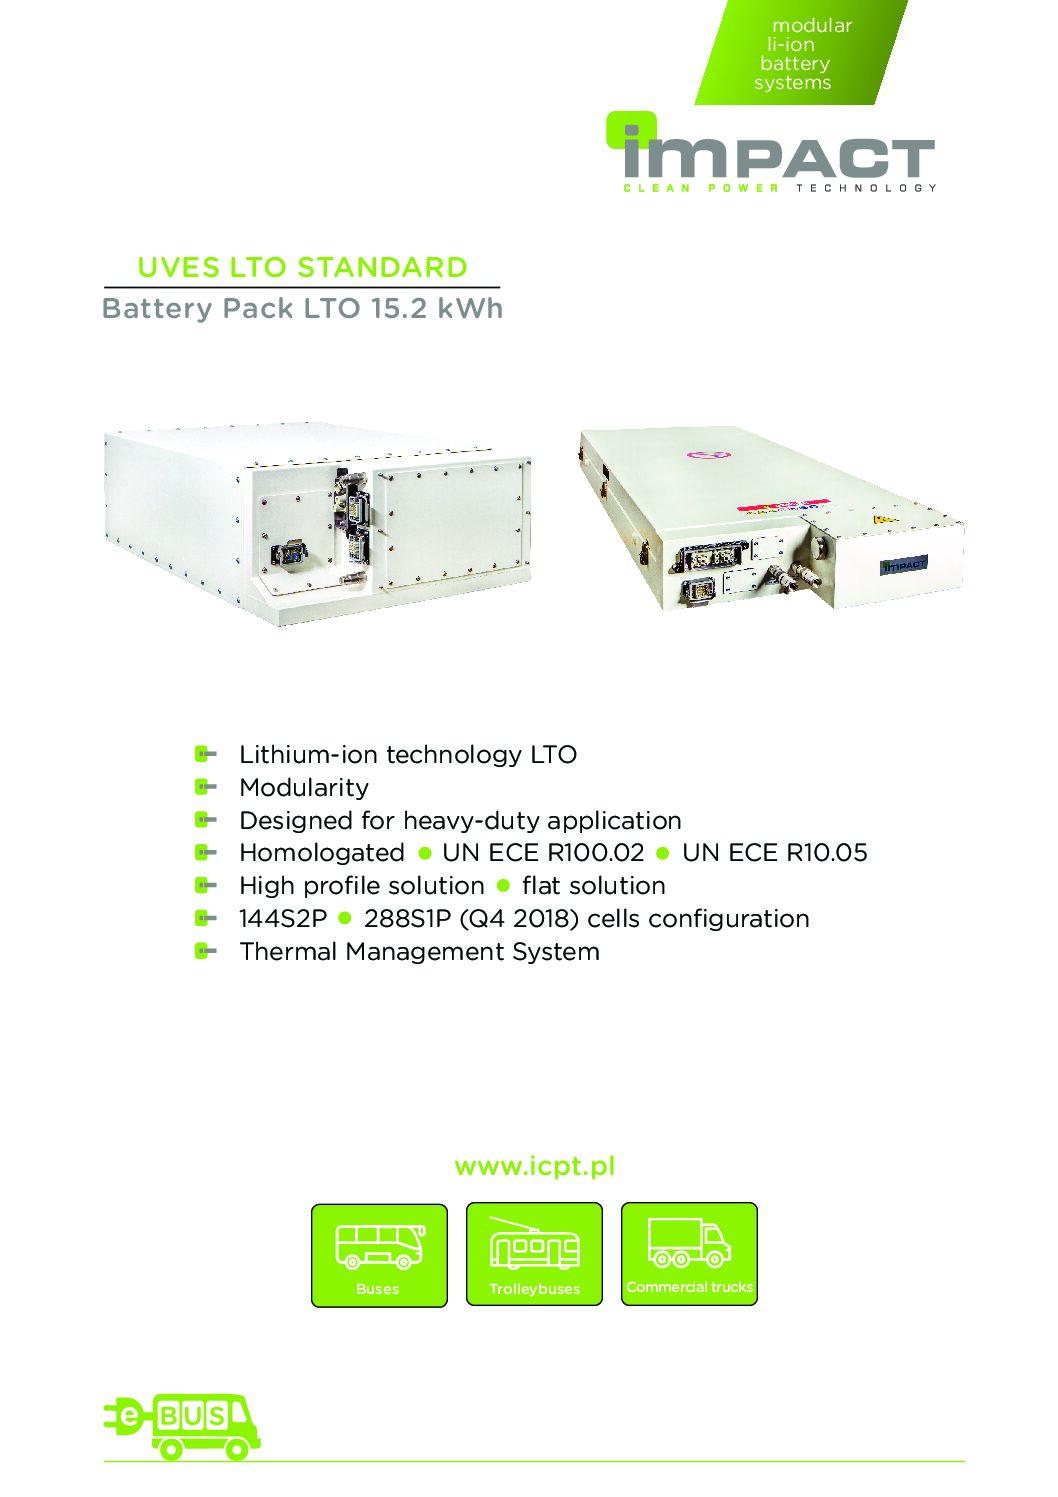 UVES LTO STANDARD Battery Pack